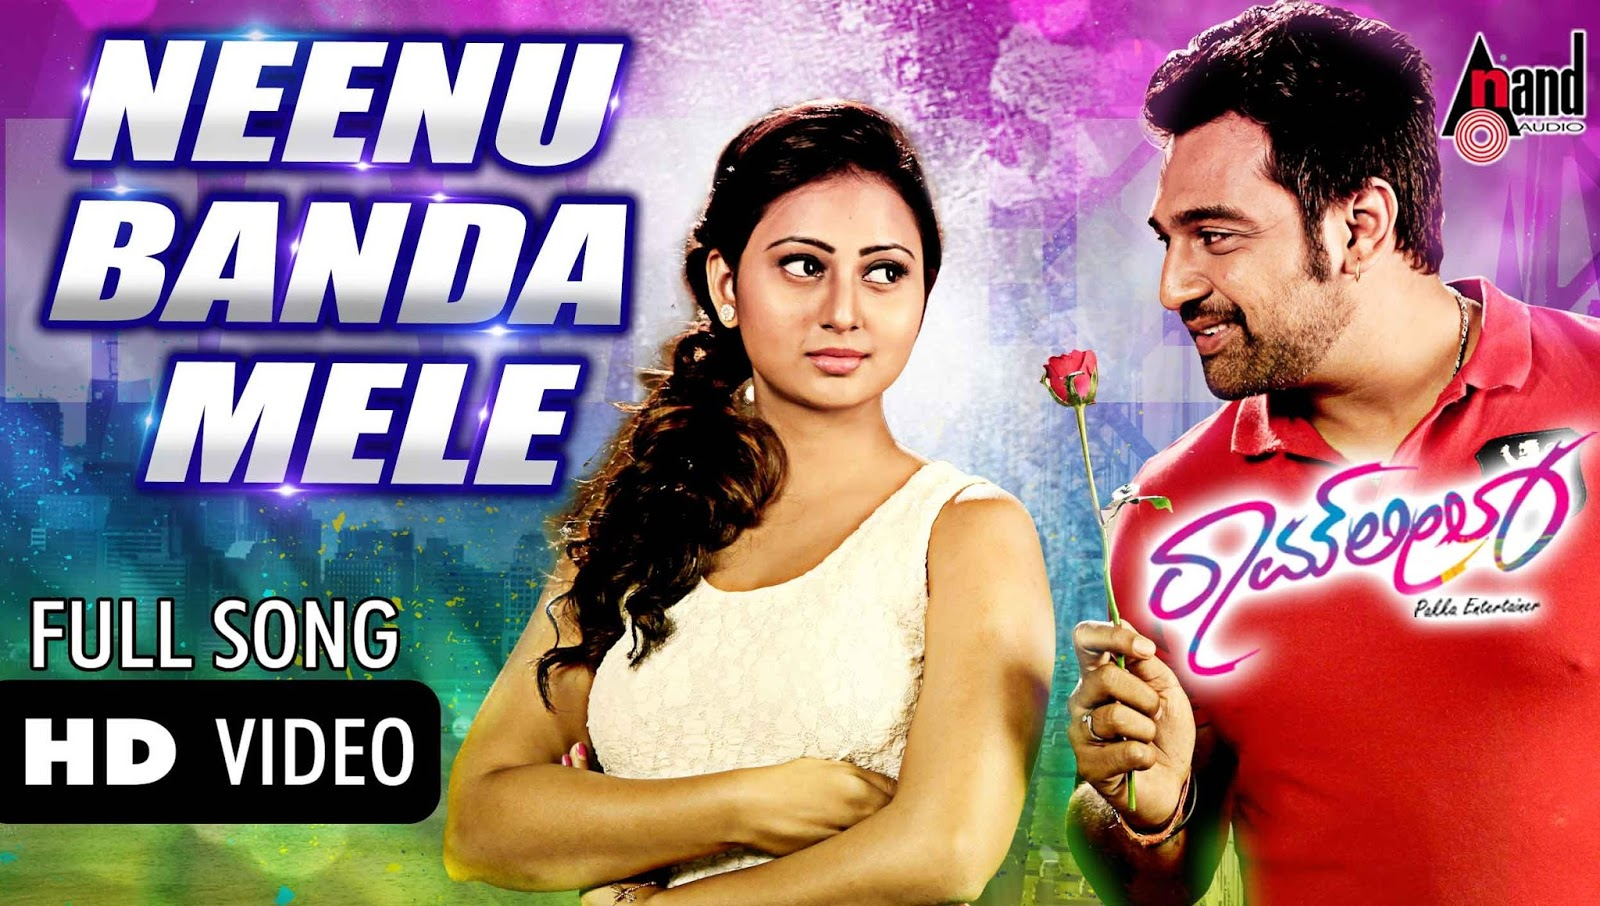 Ranbir kapoor in ram leela movie perform on lahu munh lag gaya song.